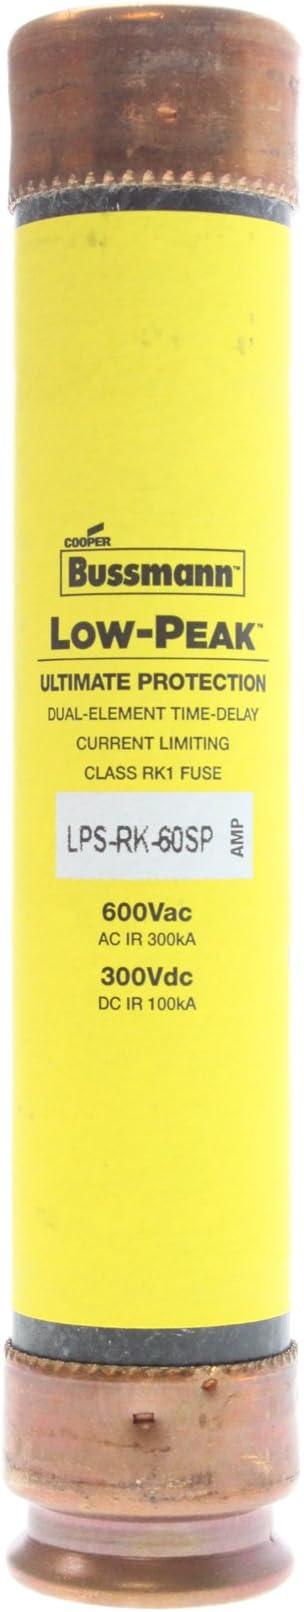 Bussmann LPS-RK-60SP Dual-Element Time-Delay Fuses Class RK1 600V 60 Amp